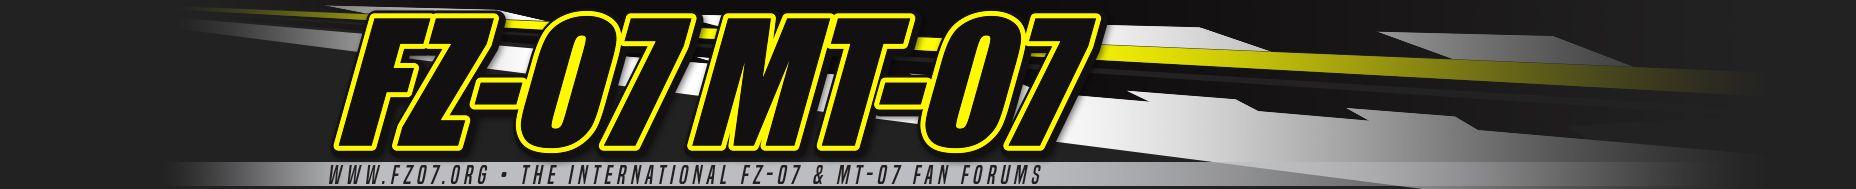 The FZ-07 Forum